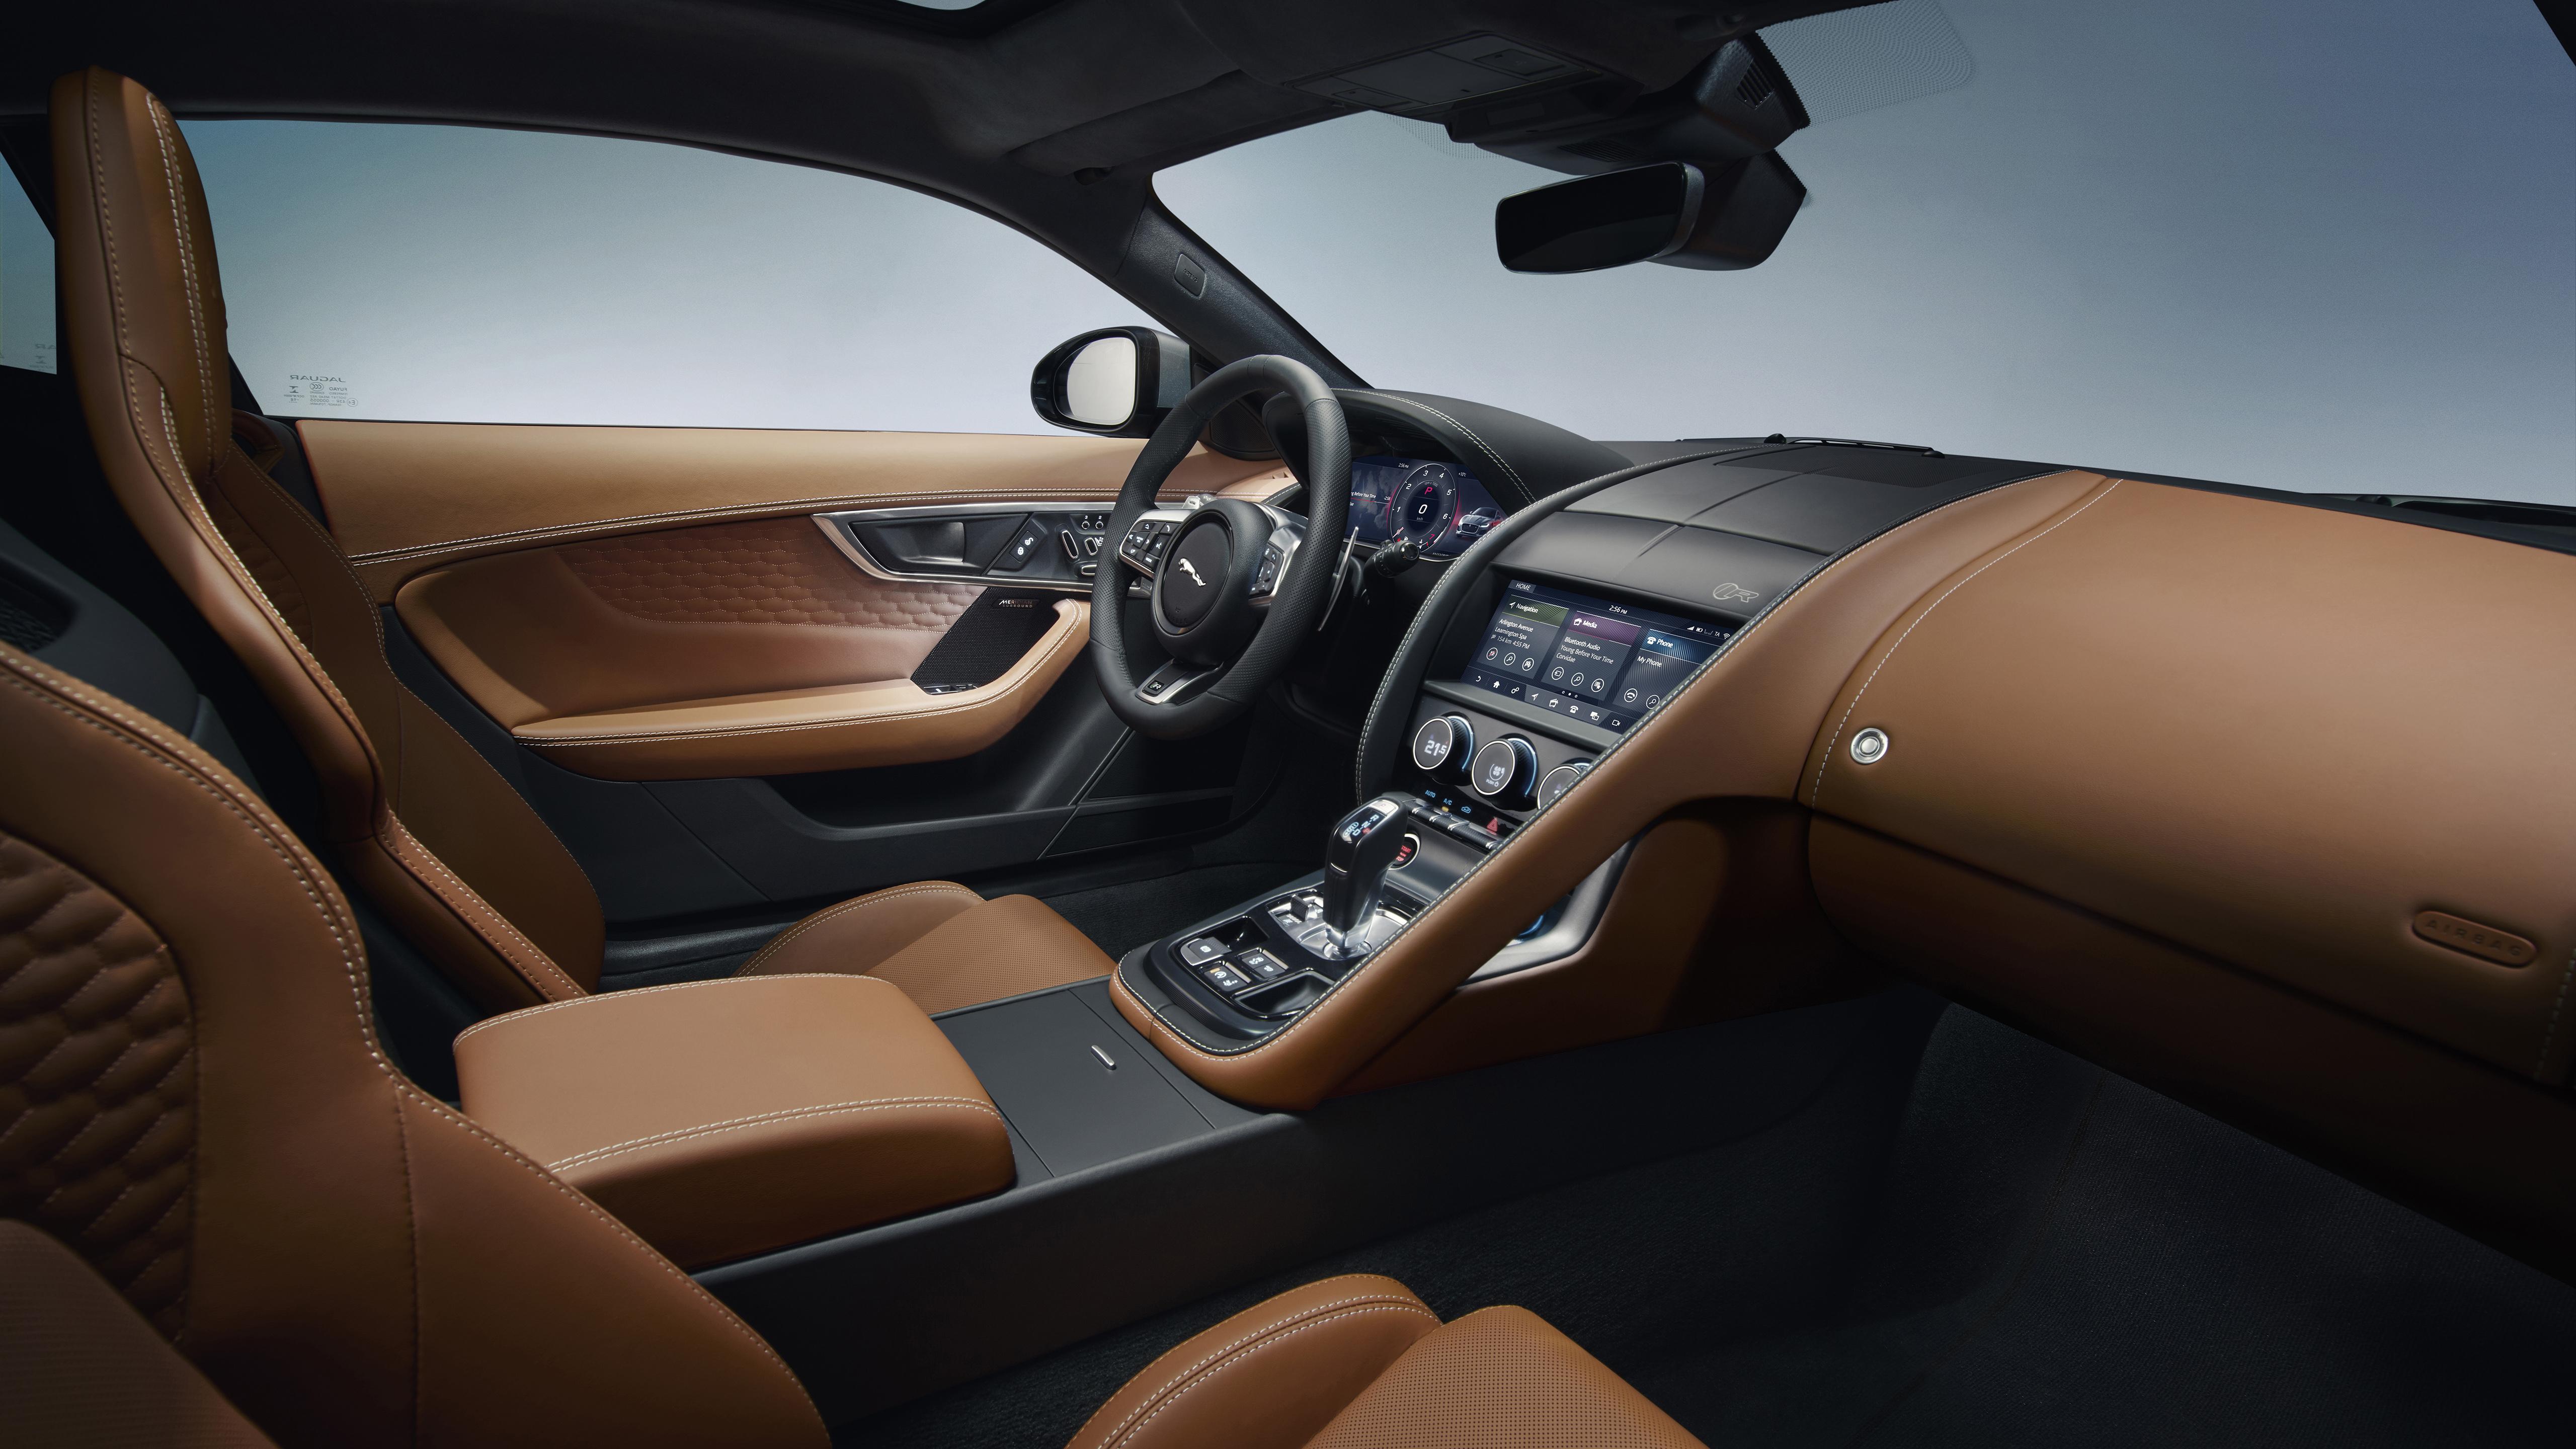 Jaguar F Type R Coupe 2020 4k Interior 2 Wallpaper Hd Car Wallpapers Id 13906